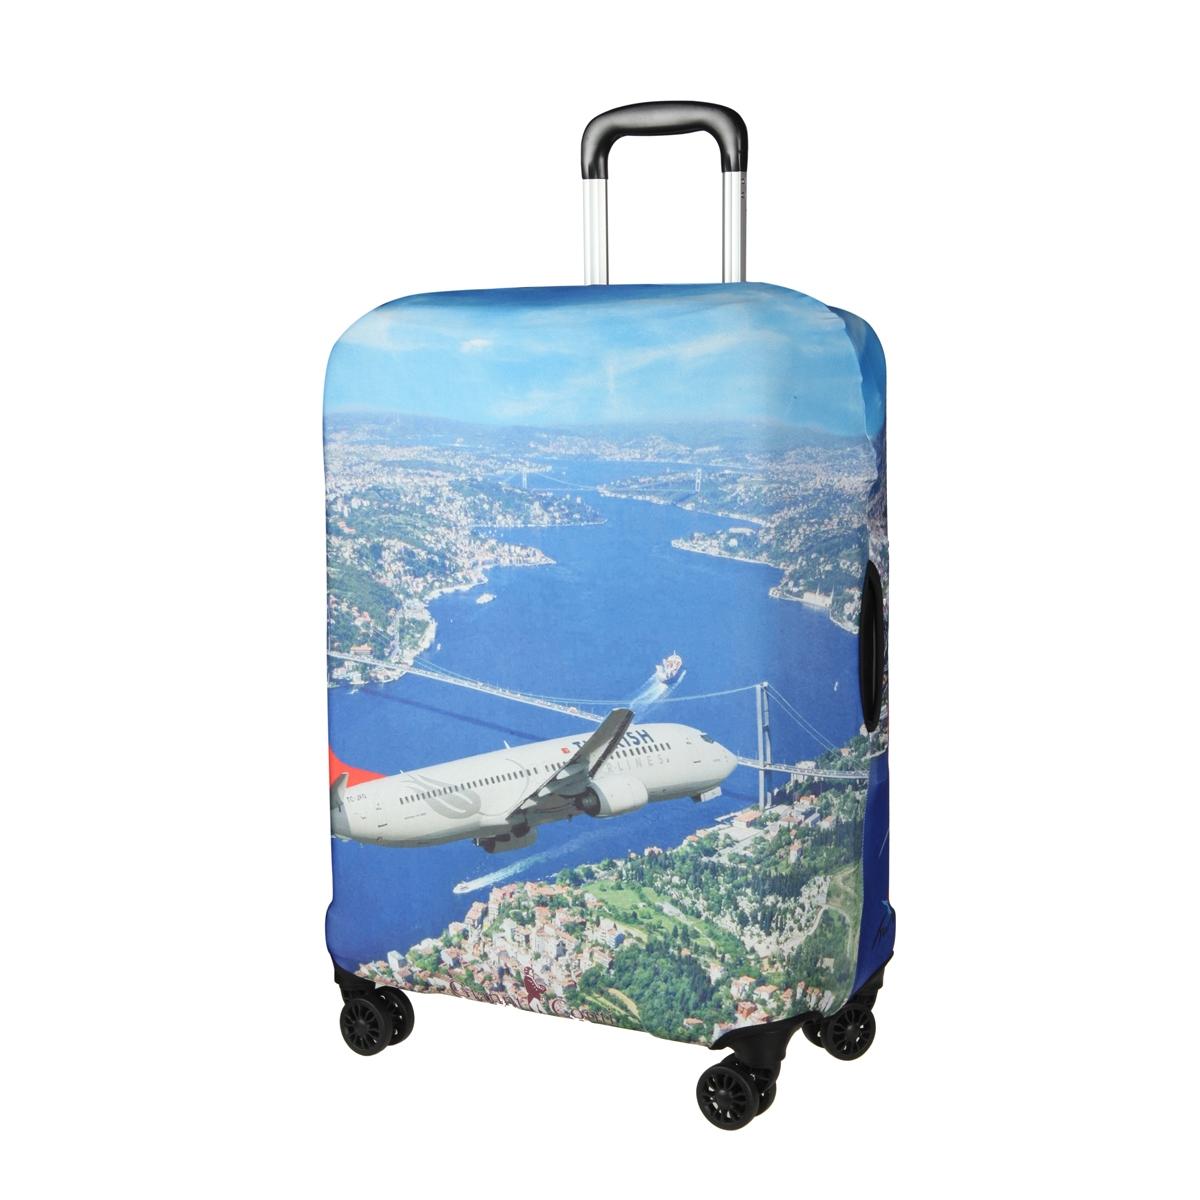 Защитное покрытие для чемодана Gianni Conti 9047 M.